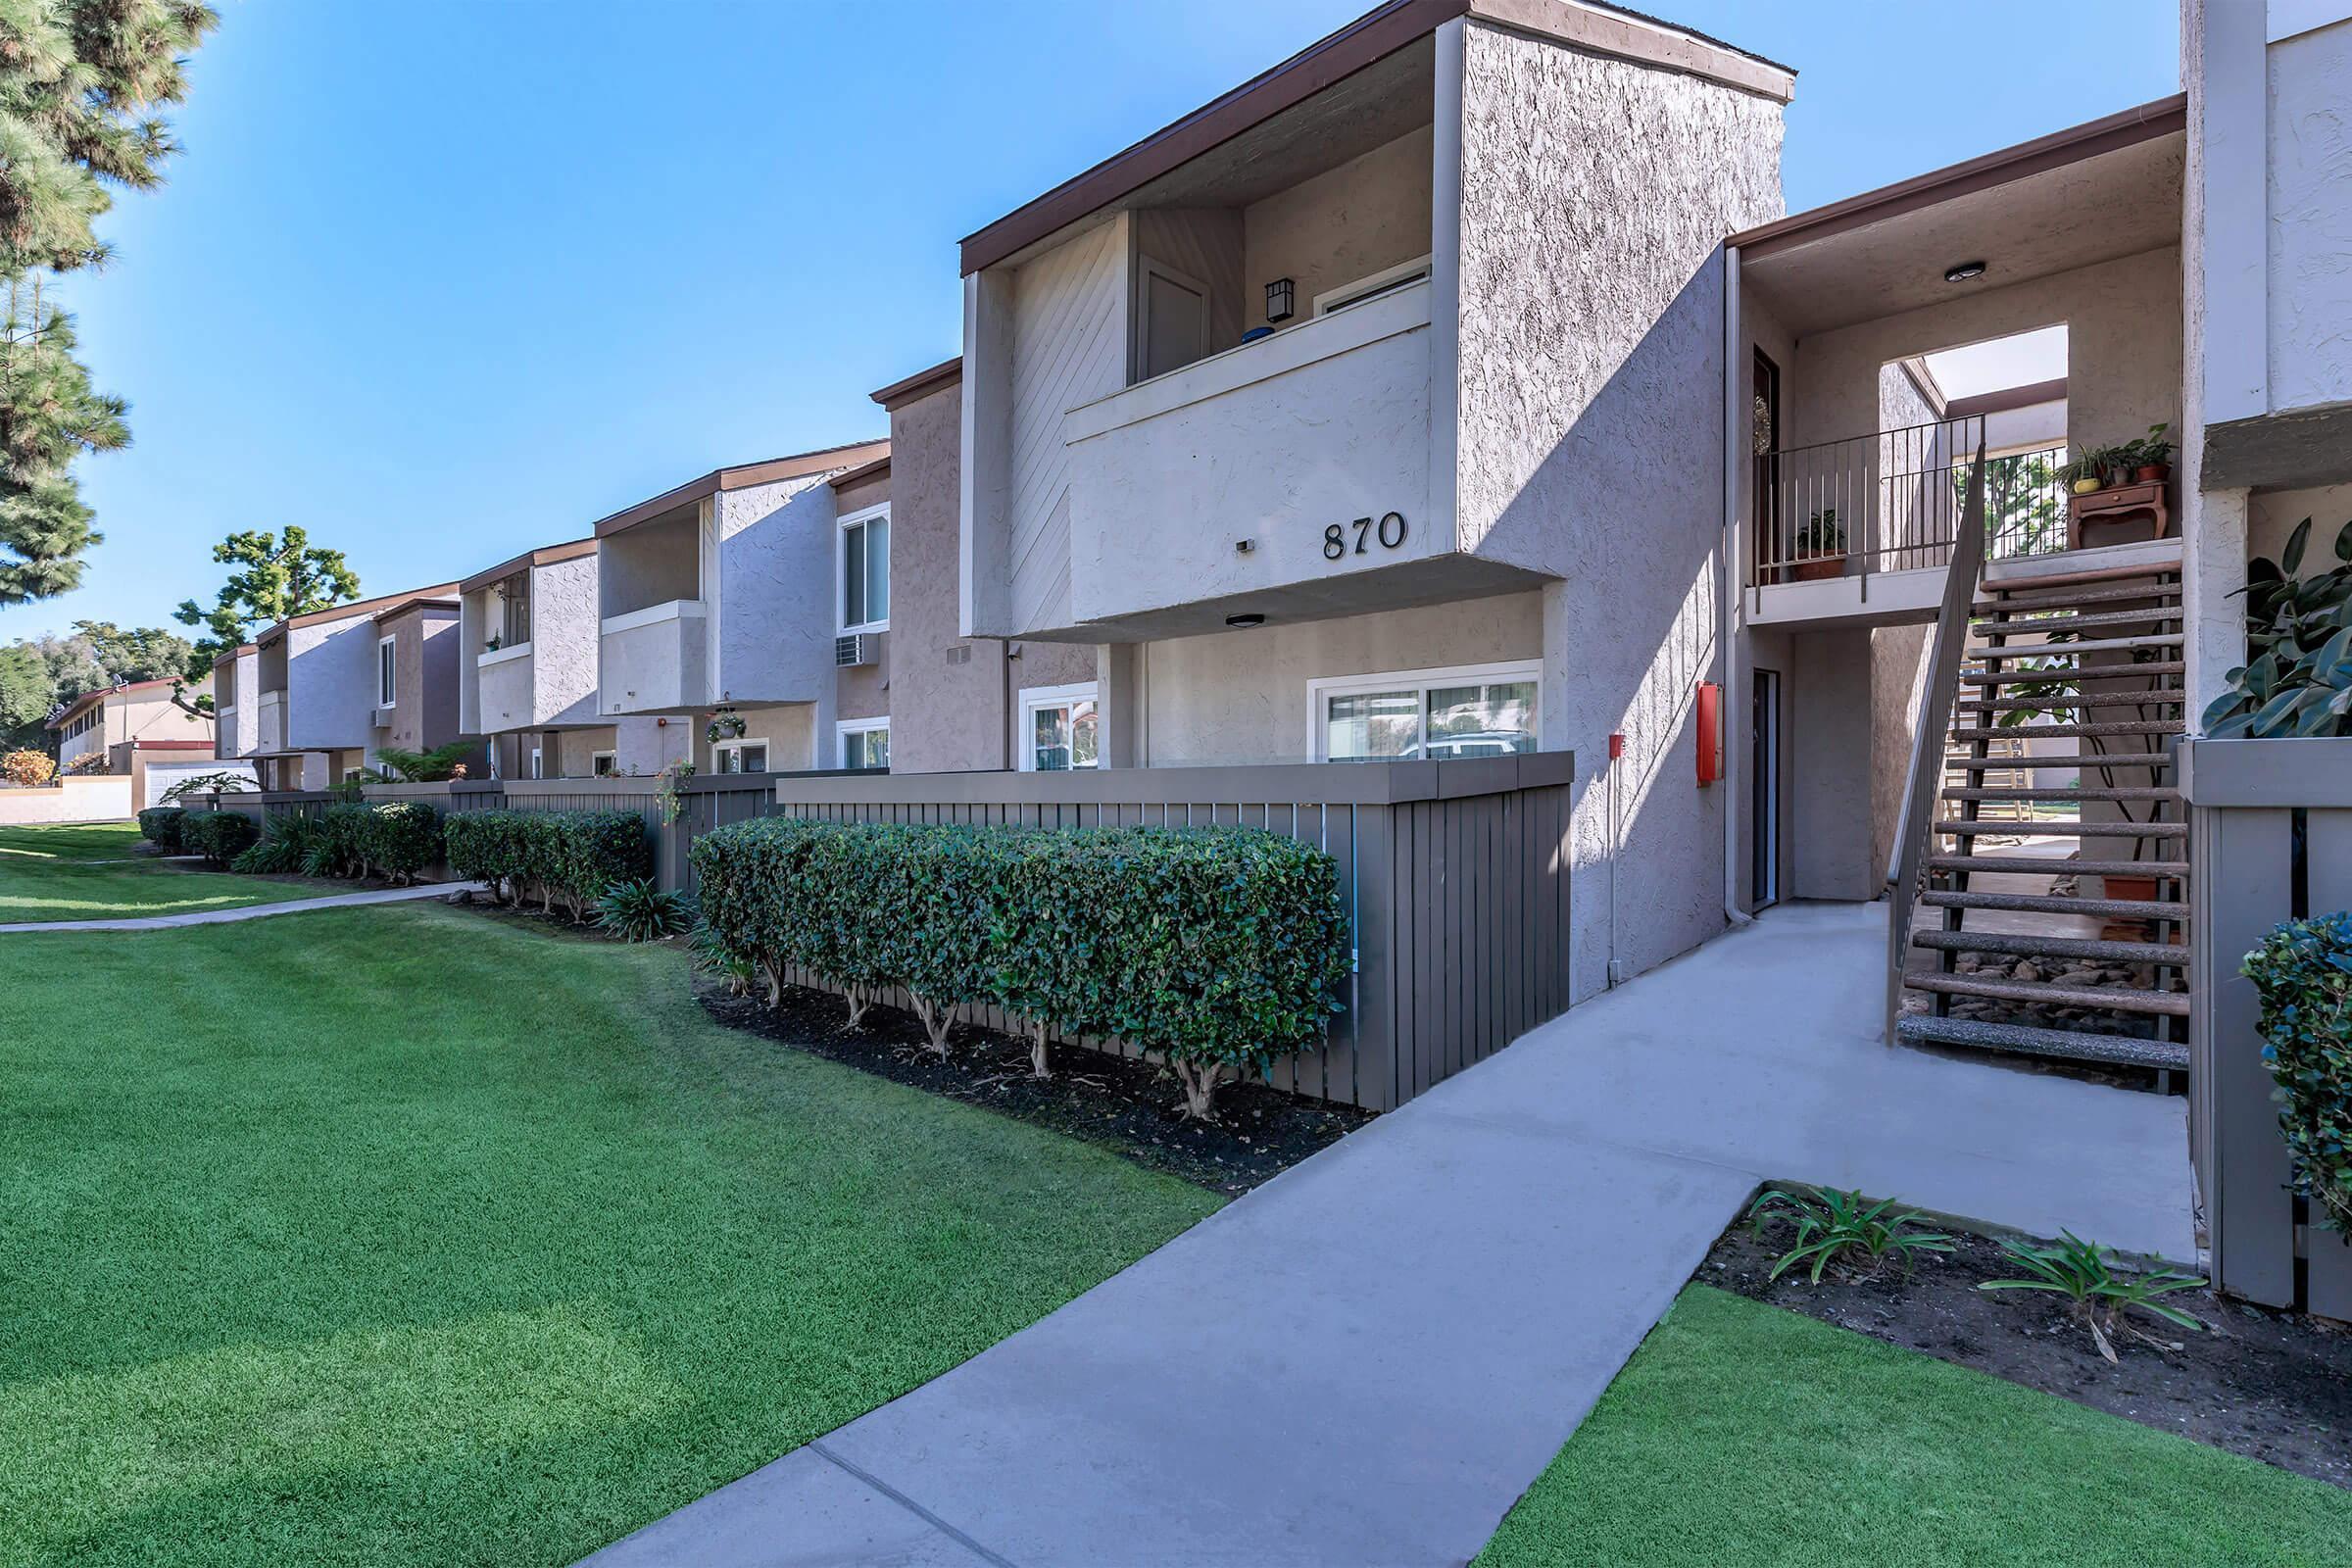 Apartments Near Claremont Plum Tree for Claremont McKenna College Students in Claremont, CA